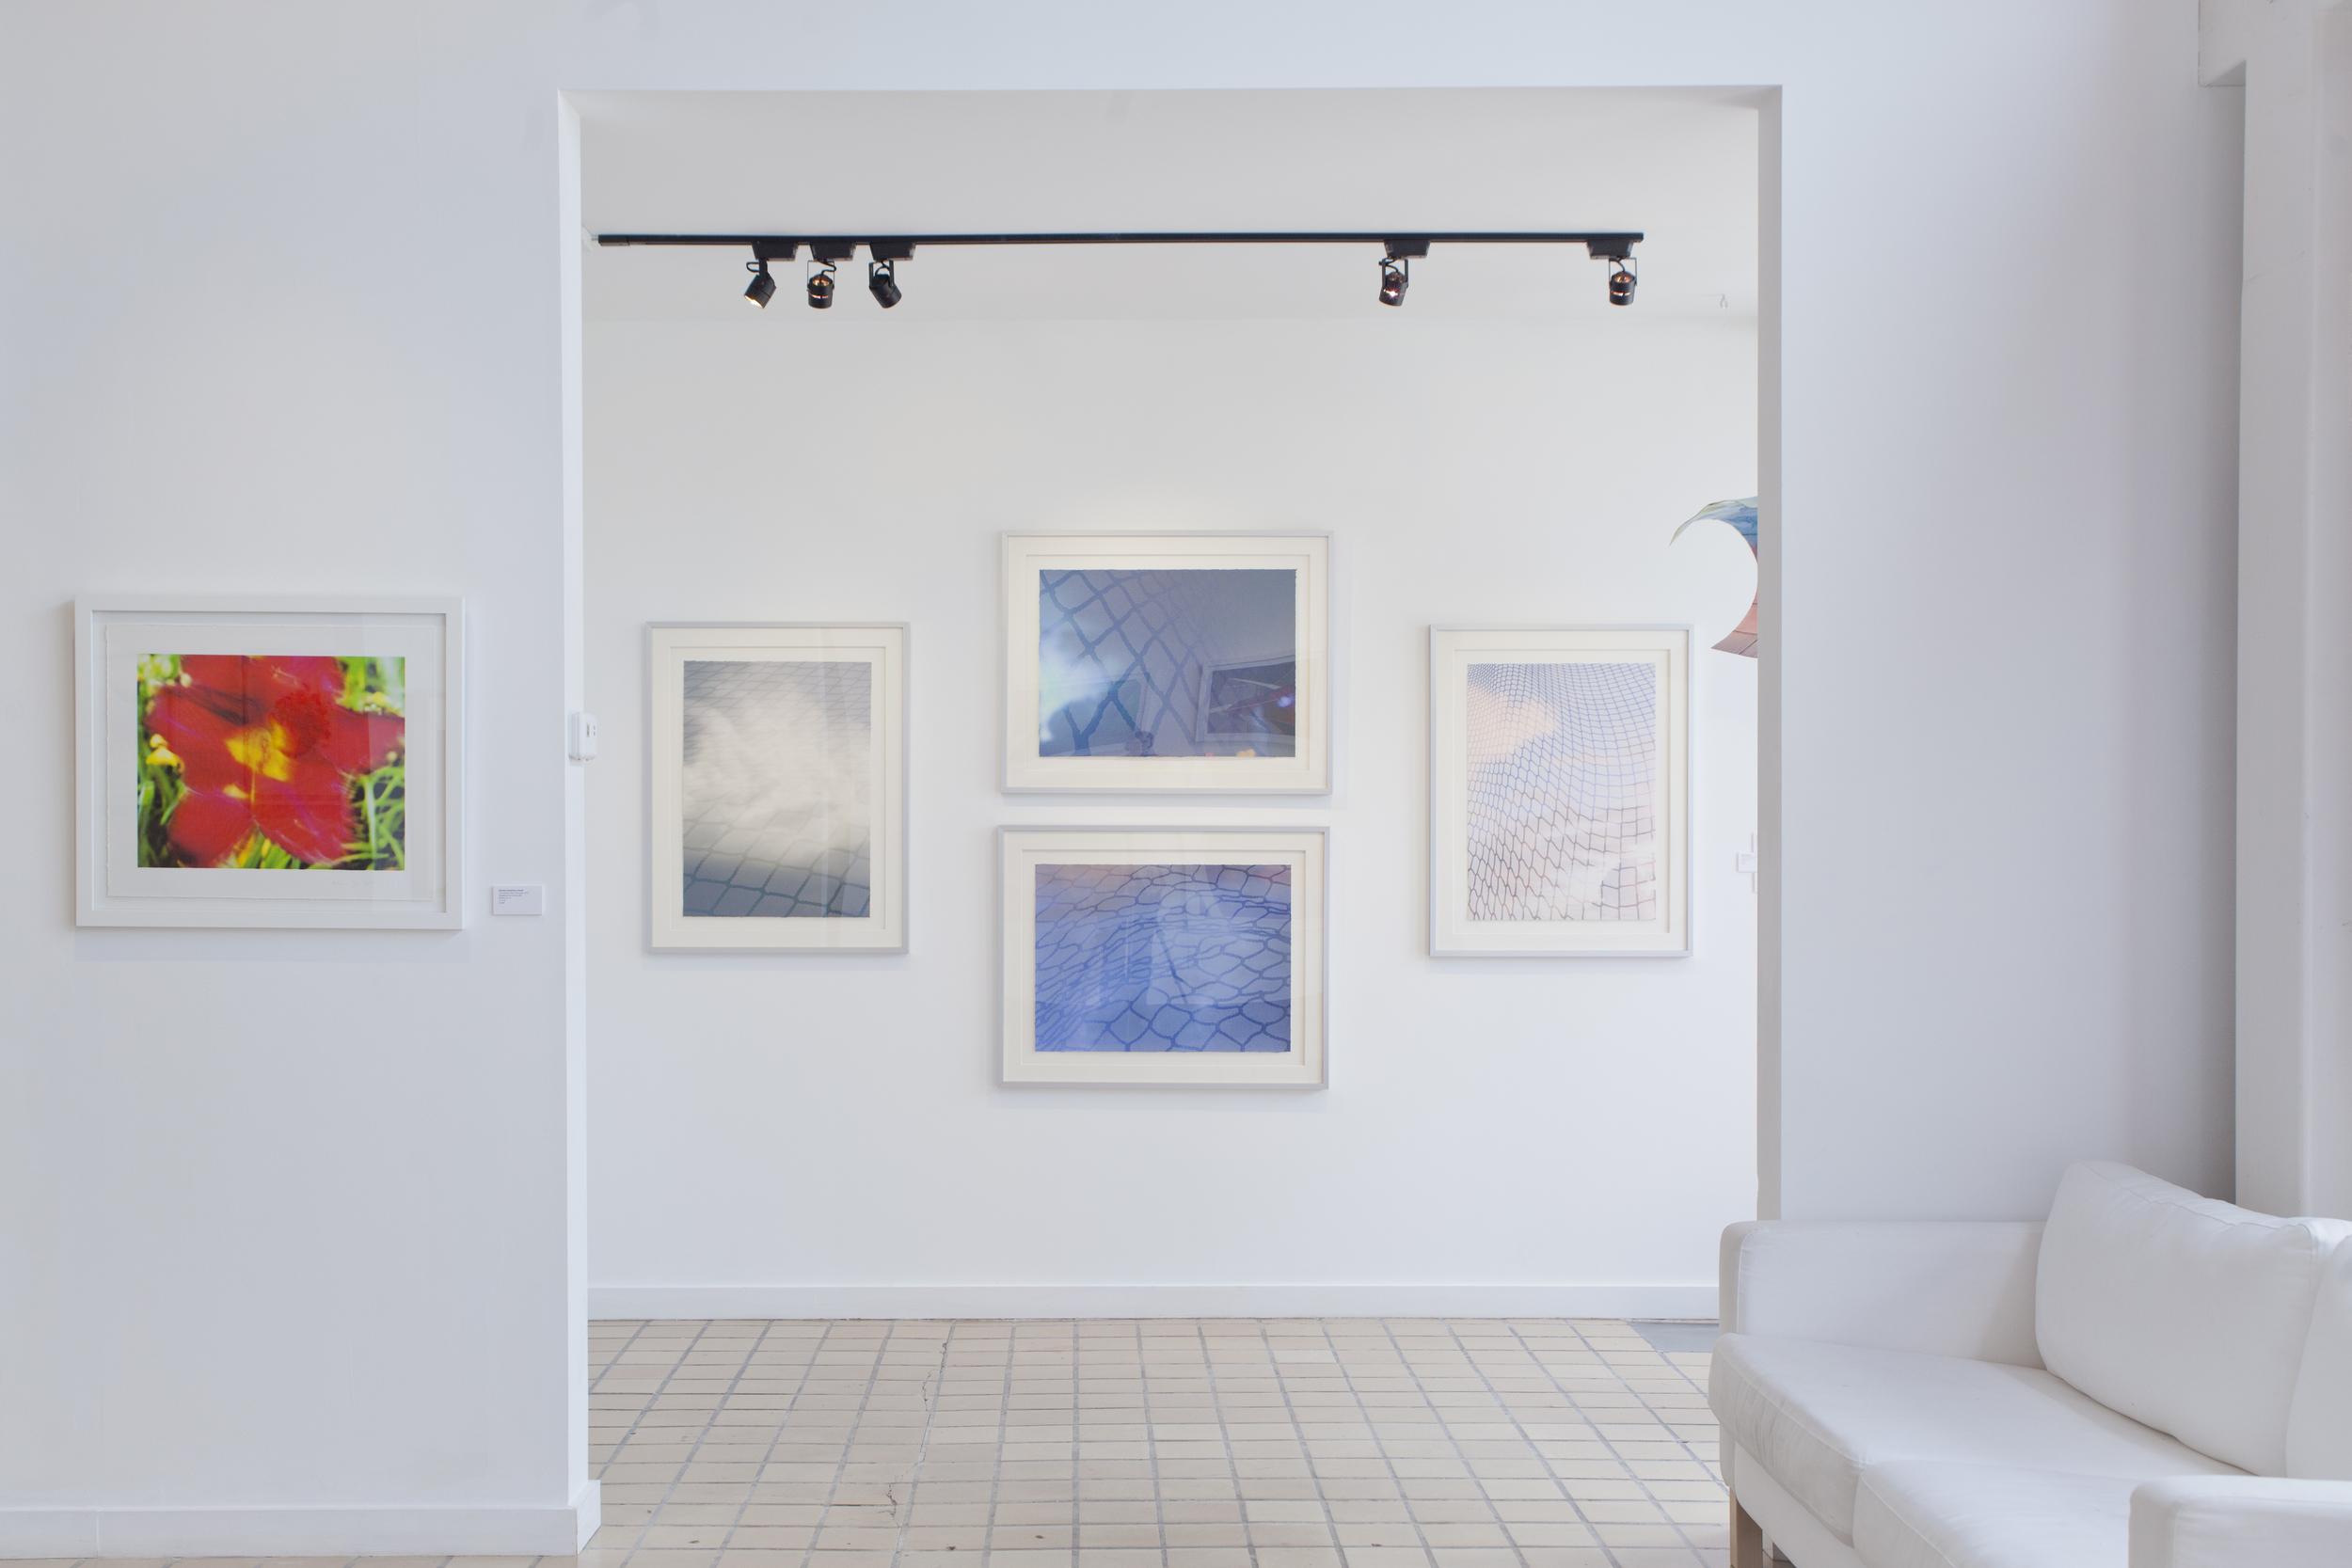 2016-06-20-Editions-highres-4189.jpg